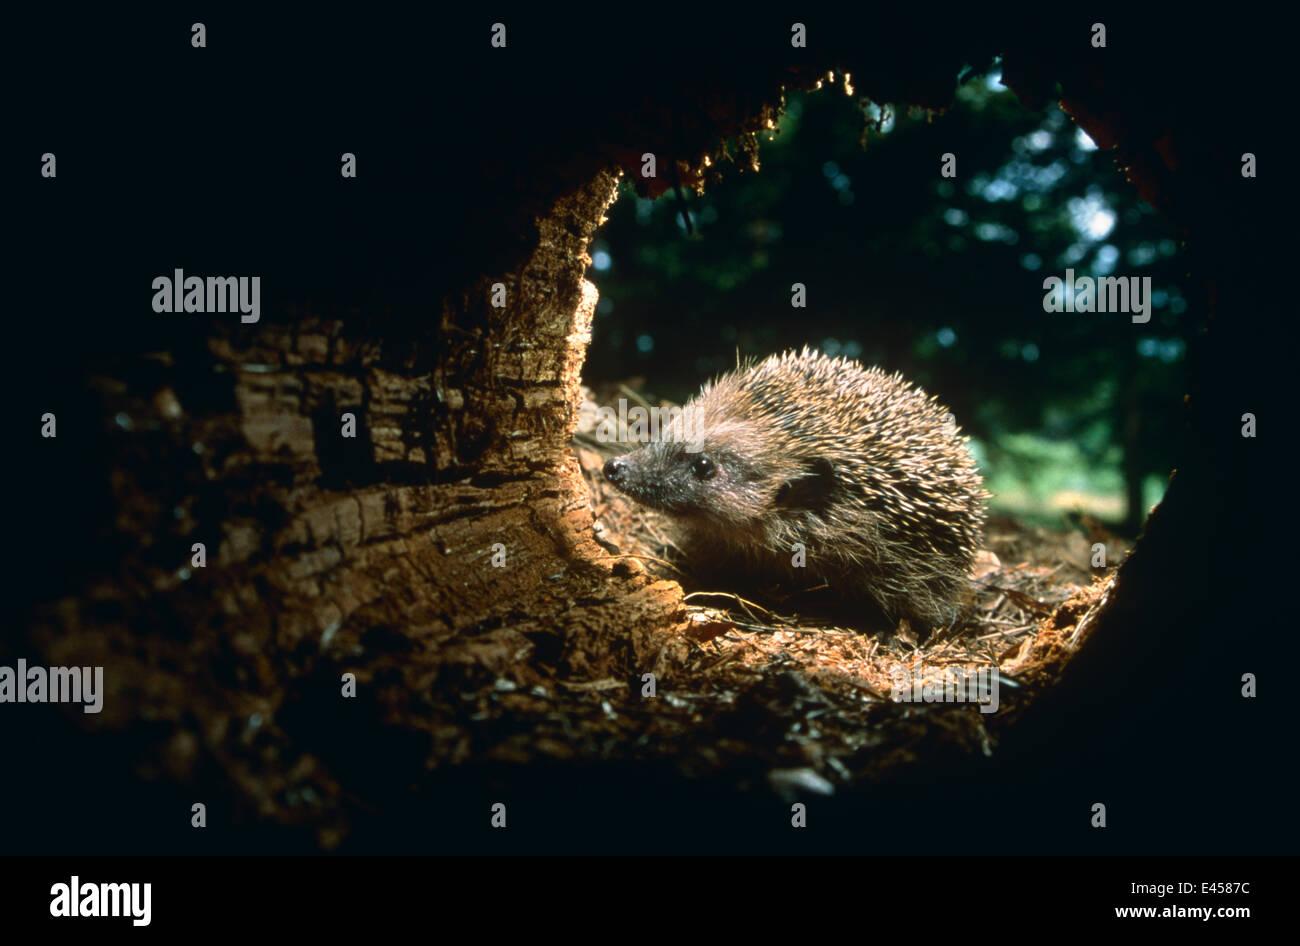 Hedgehog investigates hollow trunk {Erinaceus europaeus} Germany - Stock Image